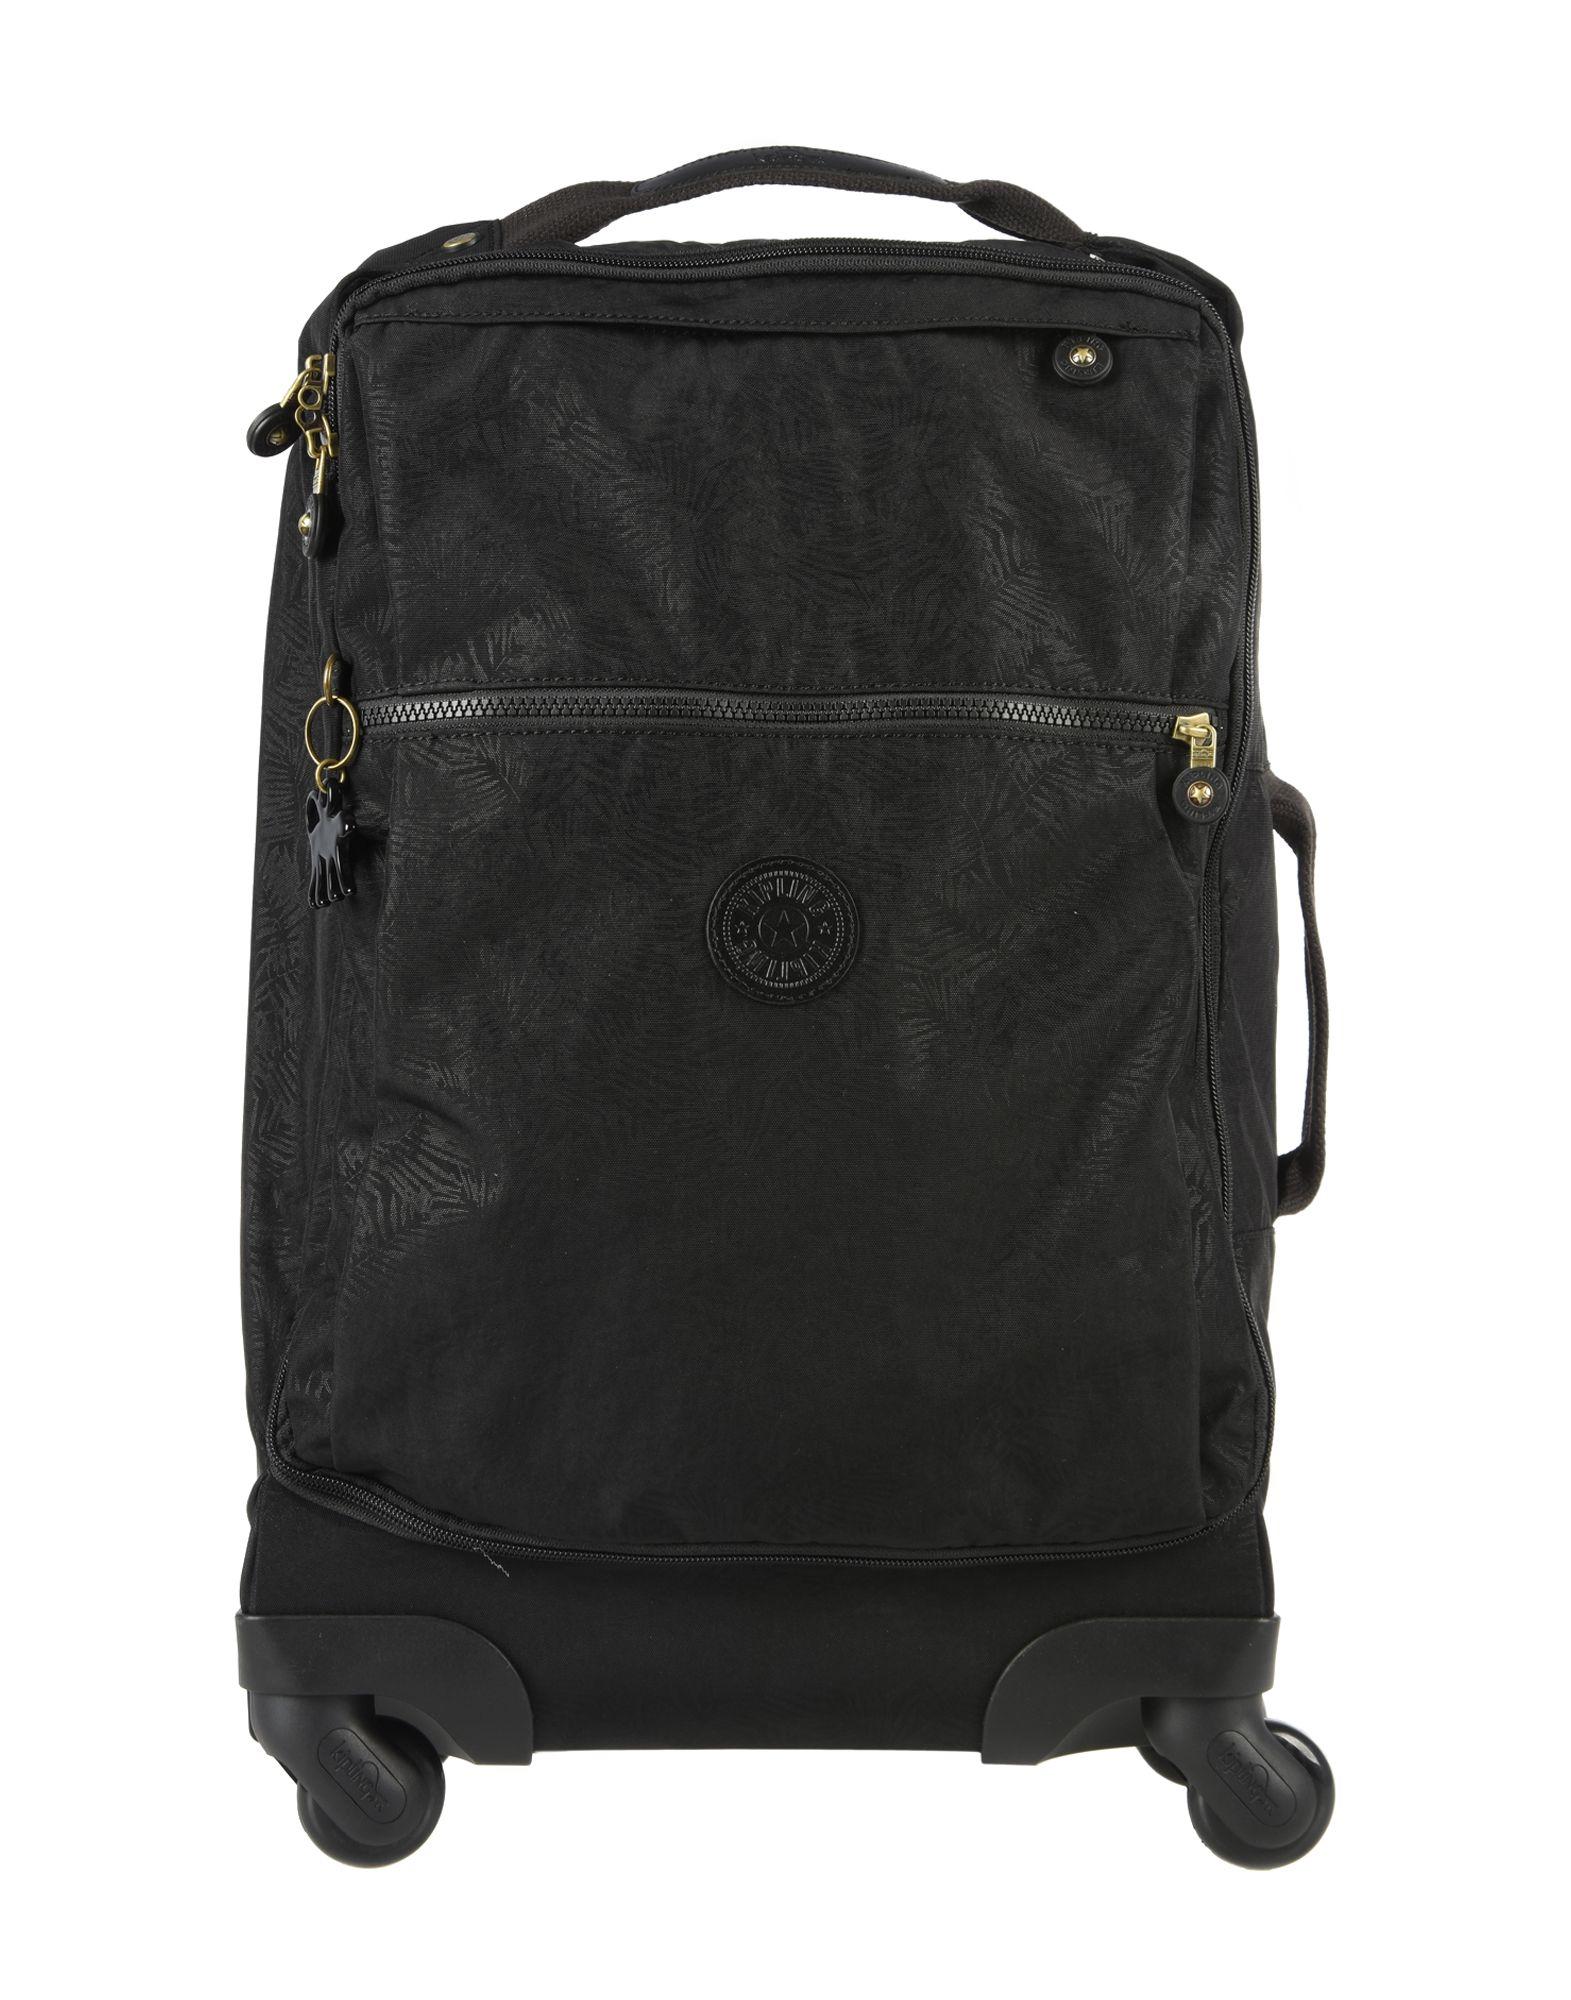 KIPLING Чемодан/сумка на колесиках сумка kipling k15256 2014